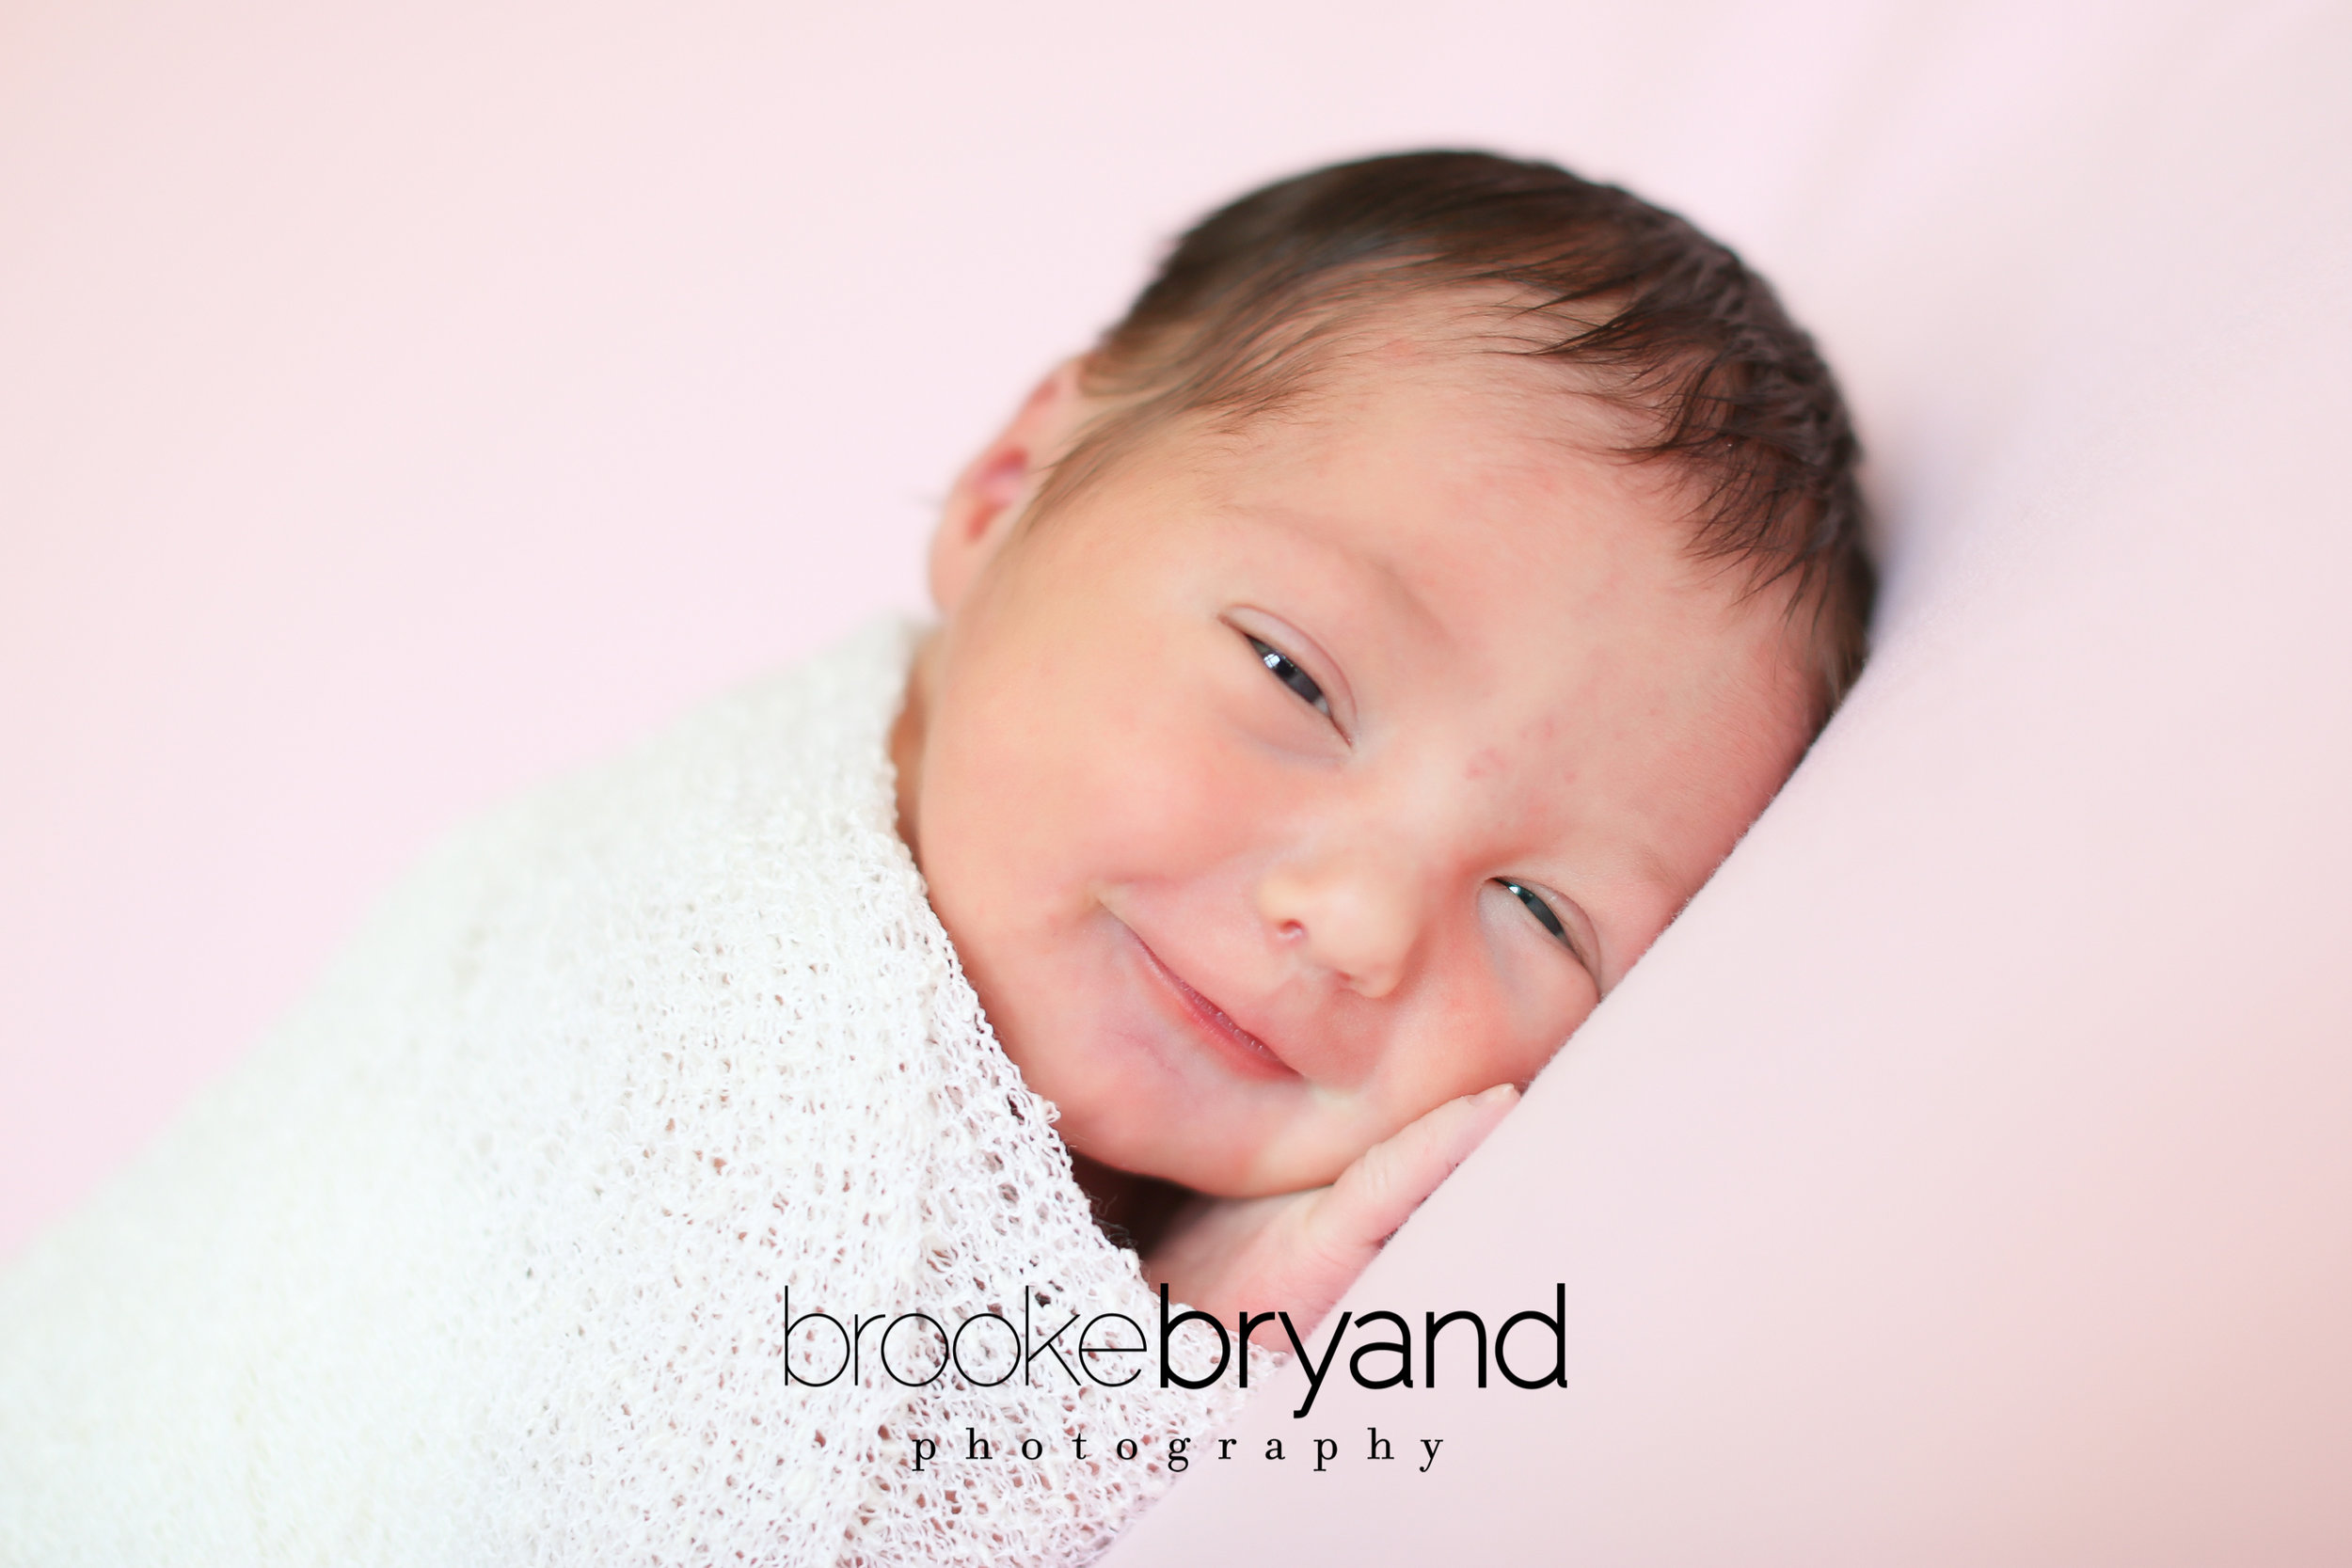 Brooke-Bryand-Photography-San-Francisco-Newborn-Photographer-IMG_1917-Edit-2.jpg